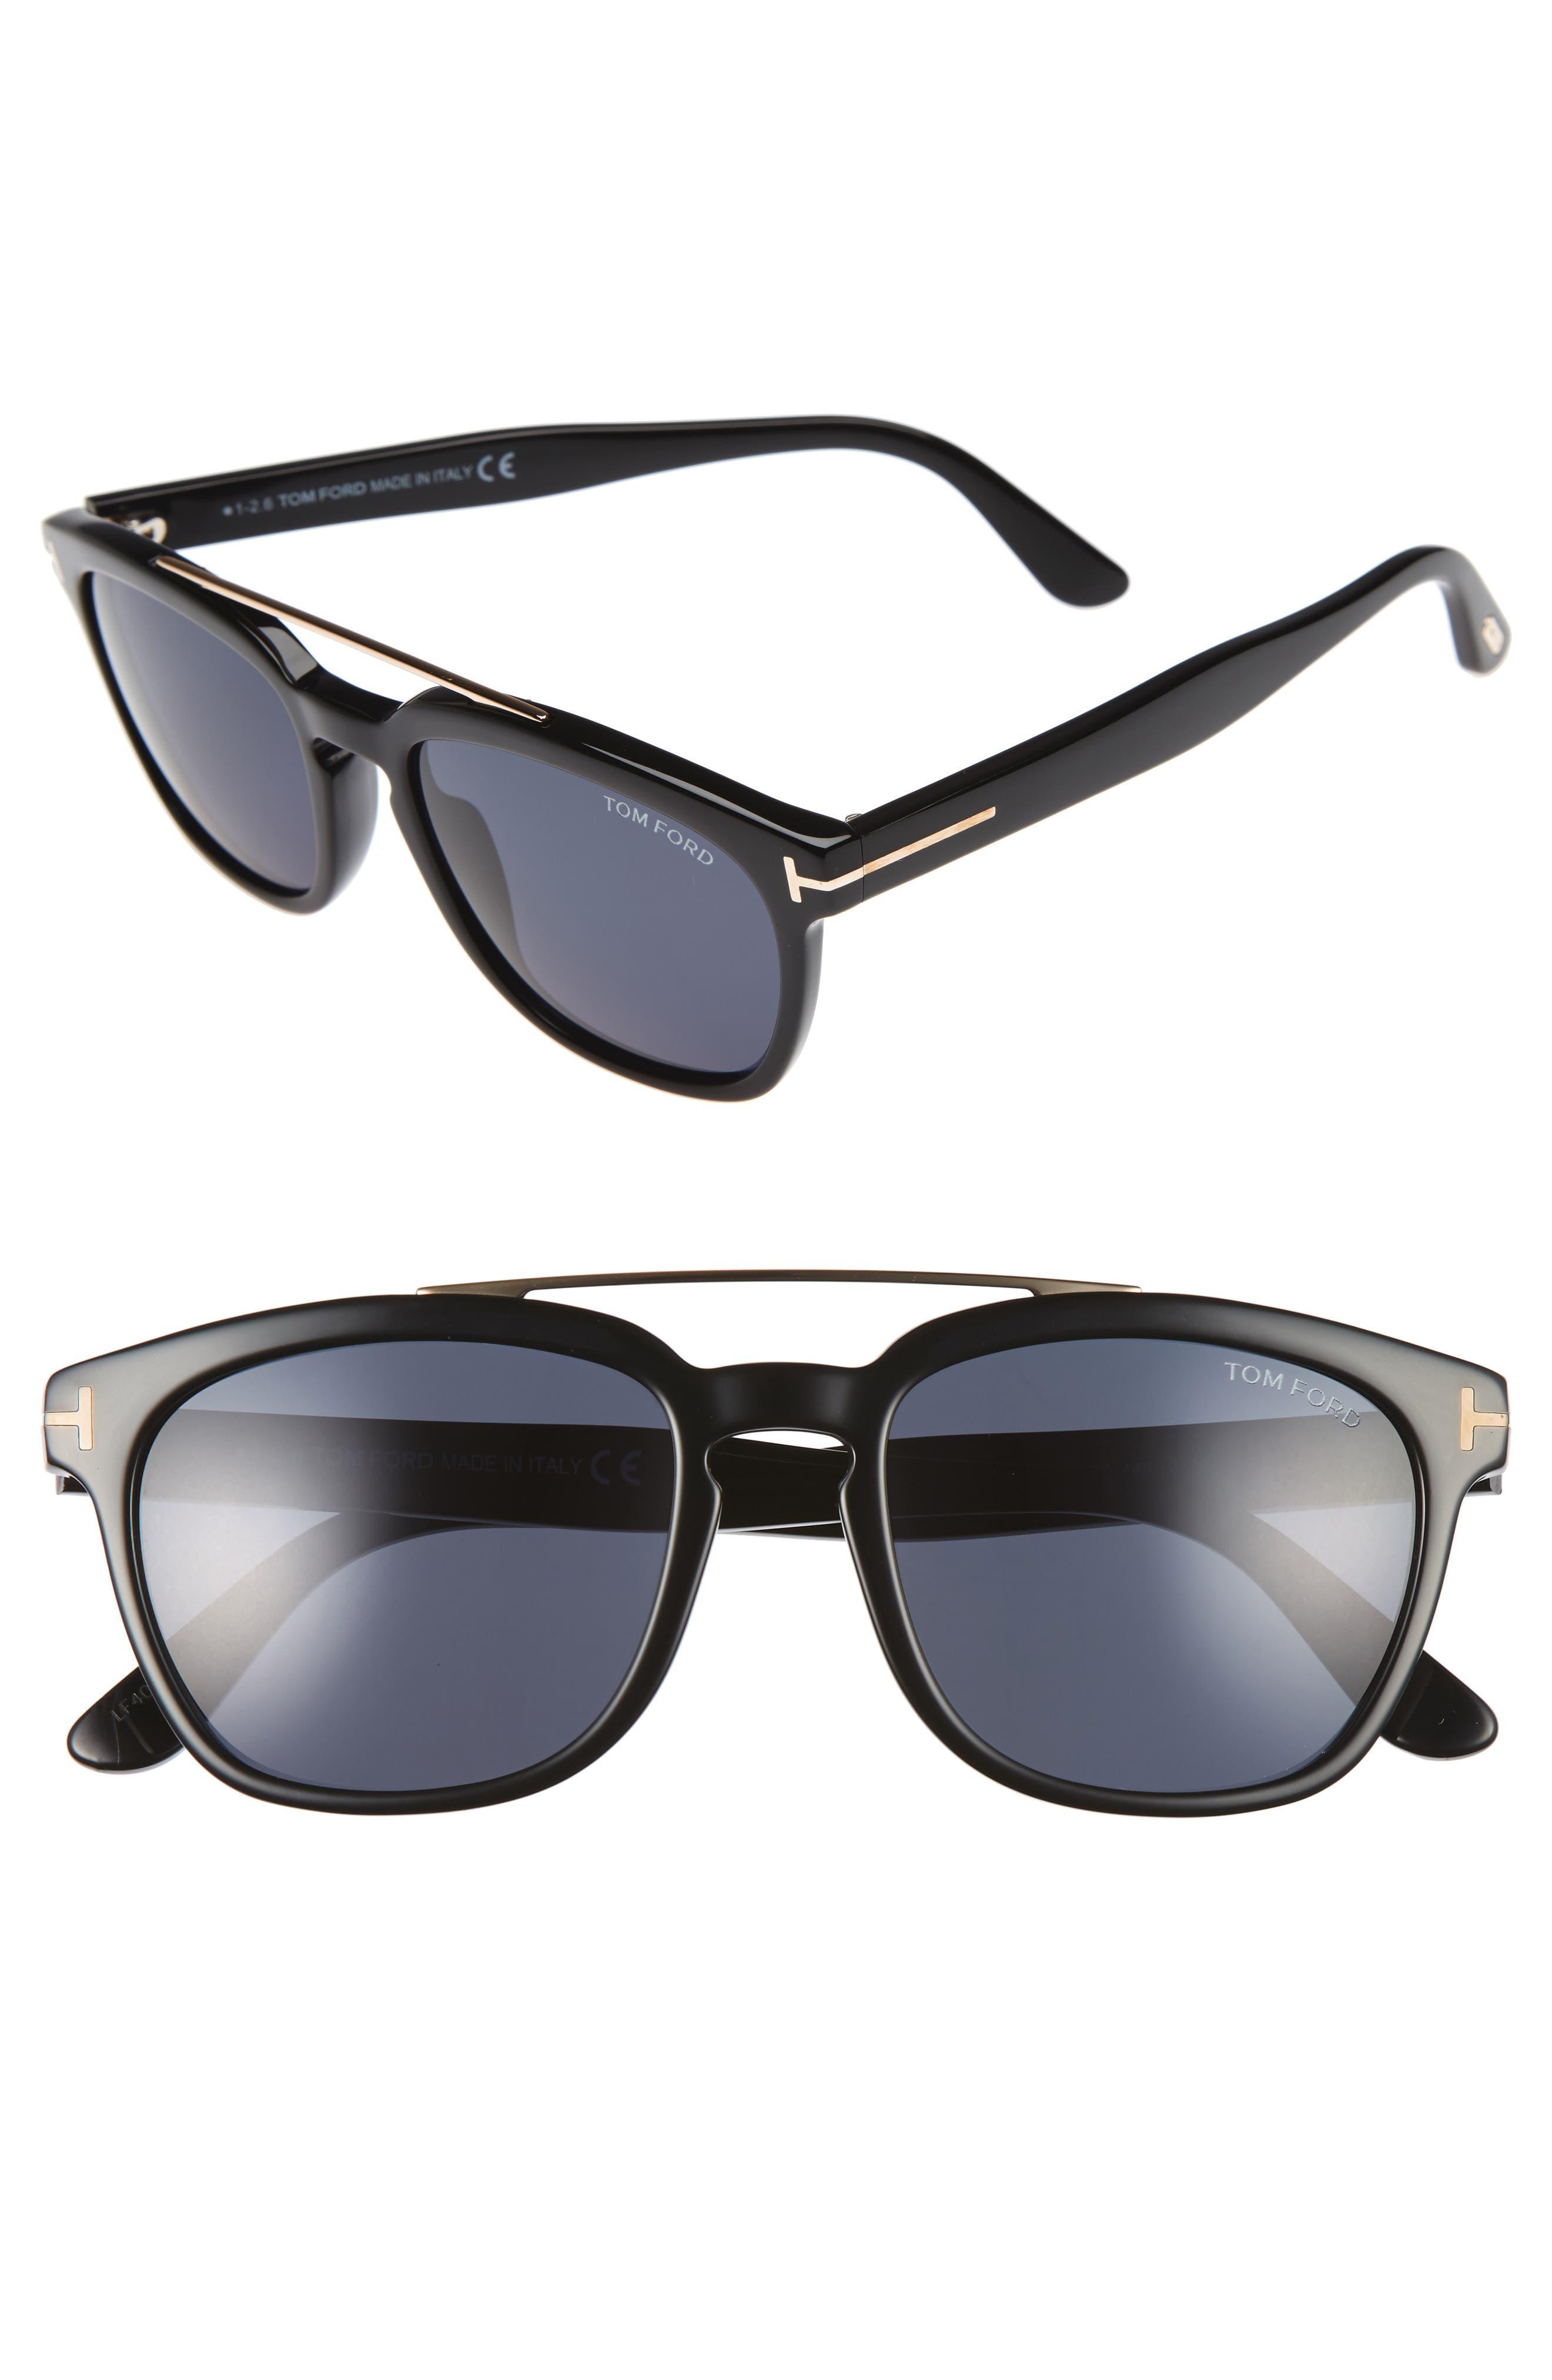 TOM FORD, Holt 54mm Sunglasses, Alternate thumbnail 2, color, 018